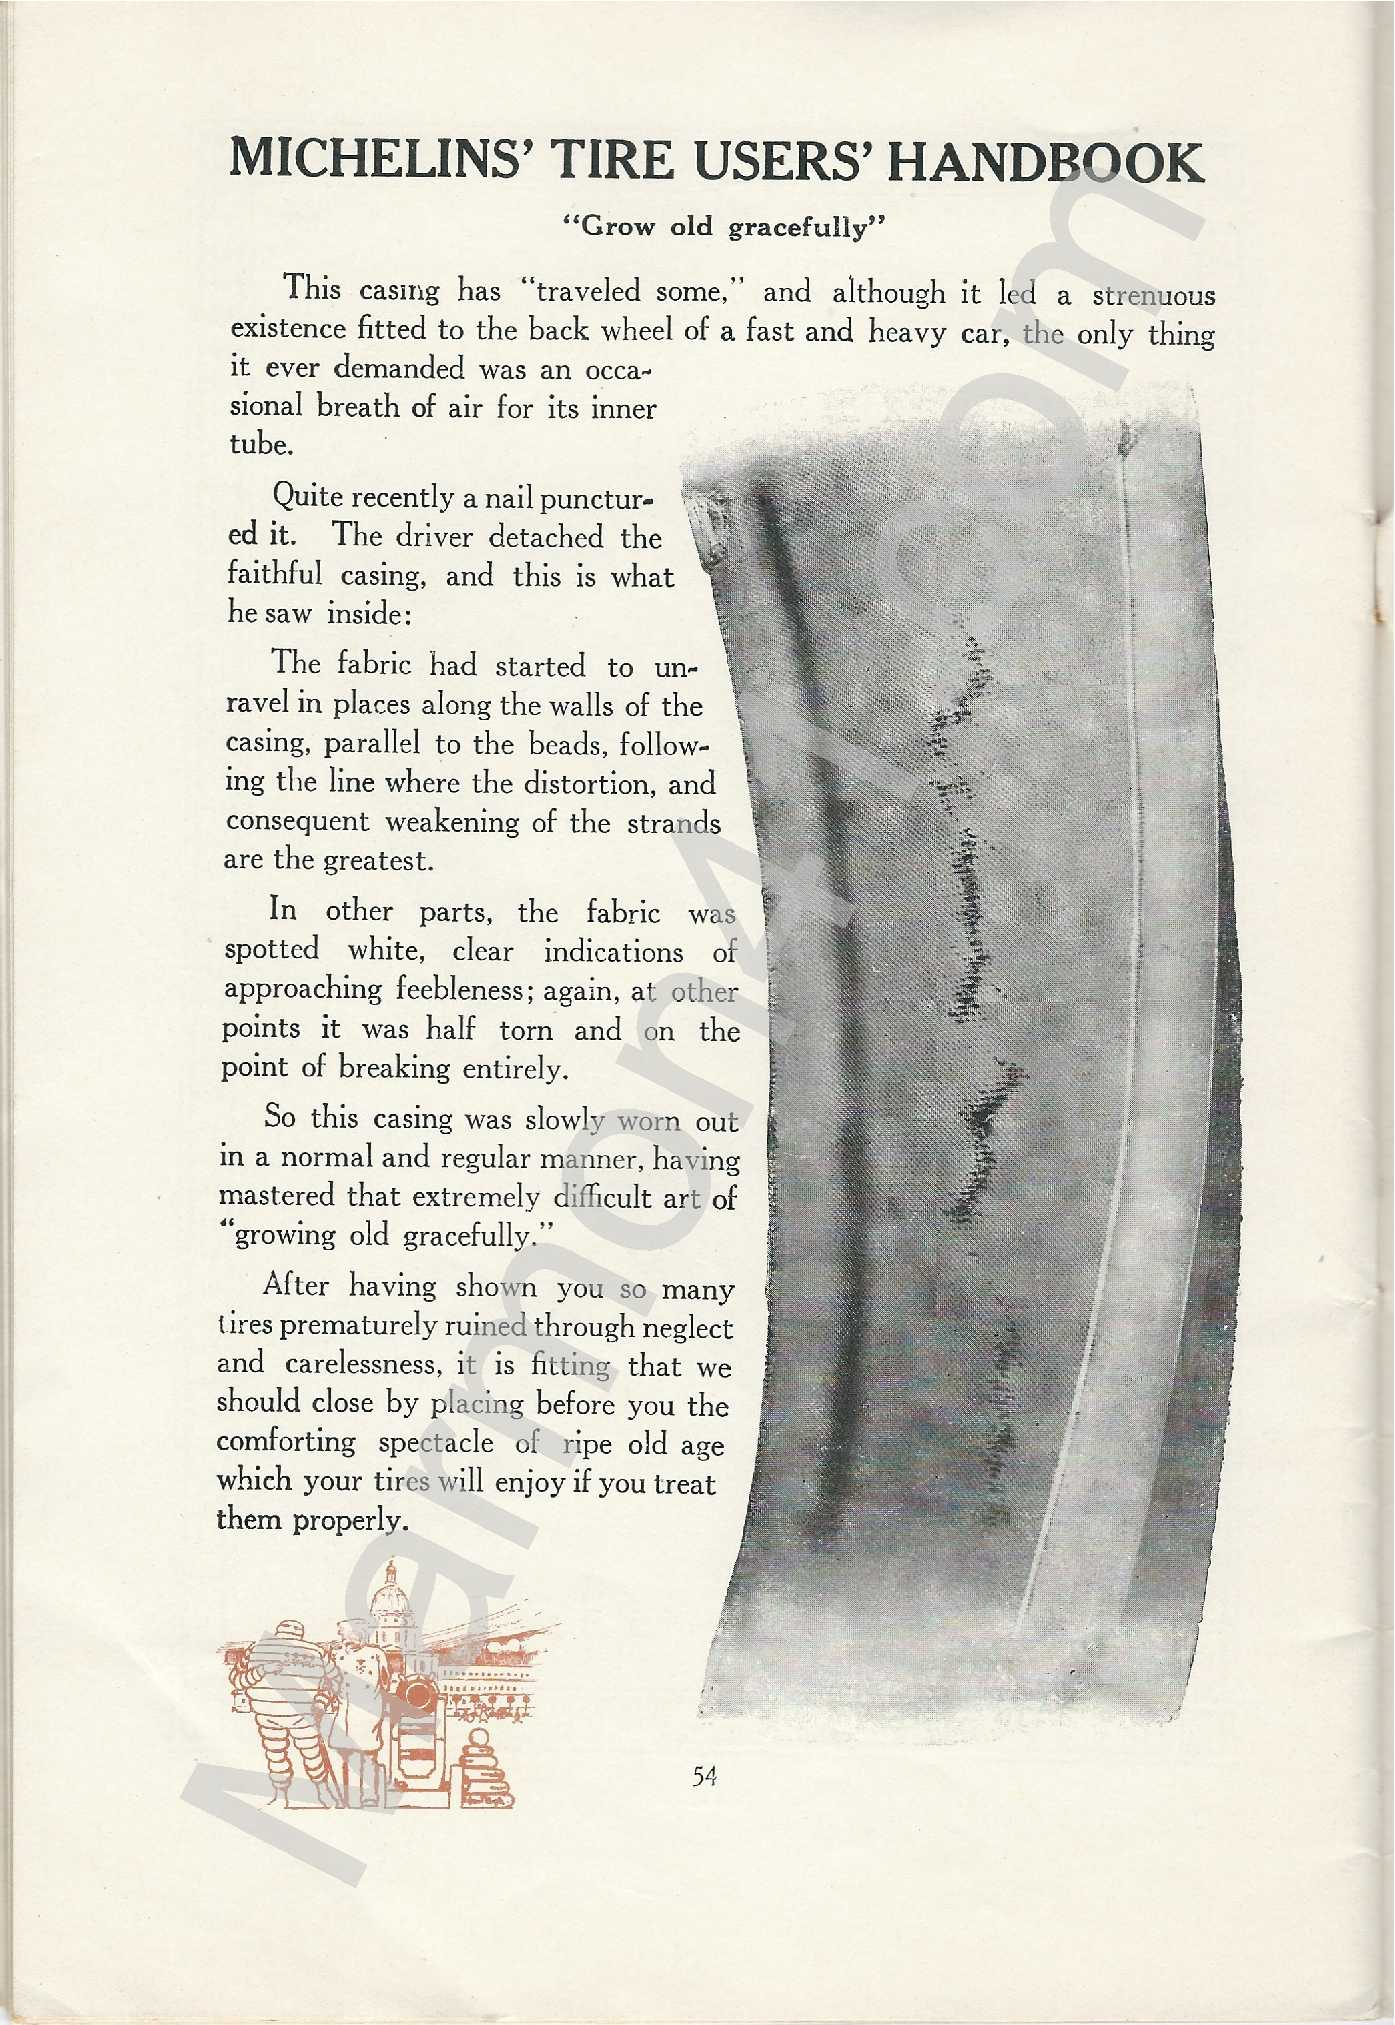 Michelins Tire Users Handbook_54